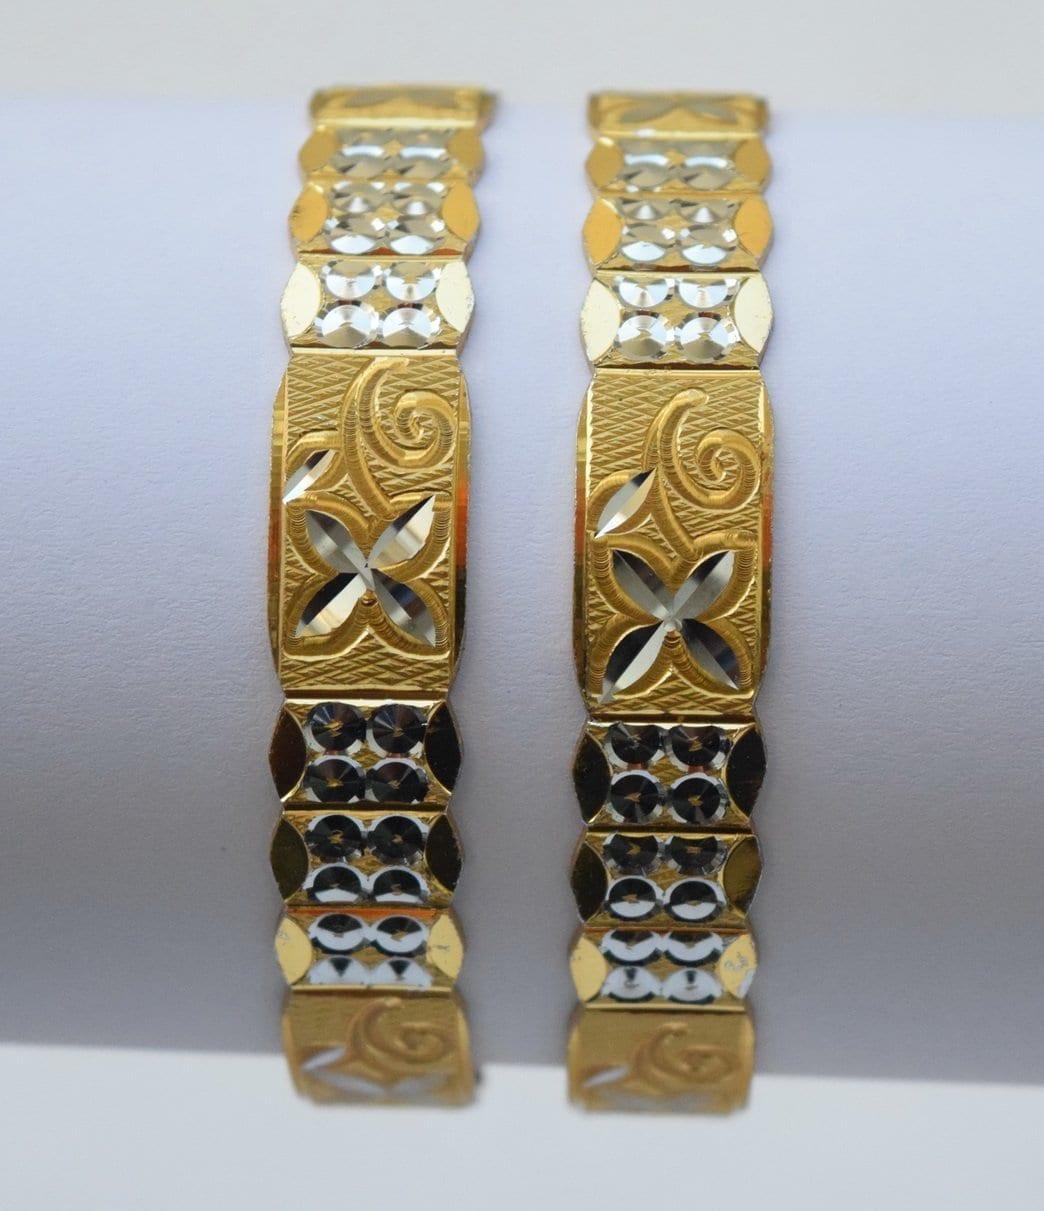 Golden Silver designer kangan bangles set of 2 pieces BN156 2